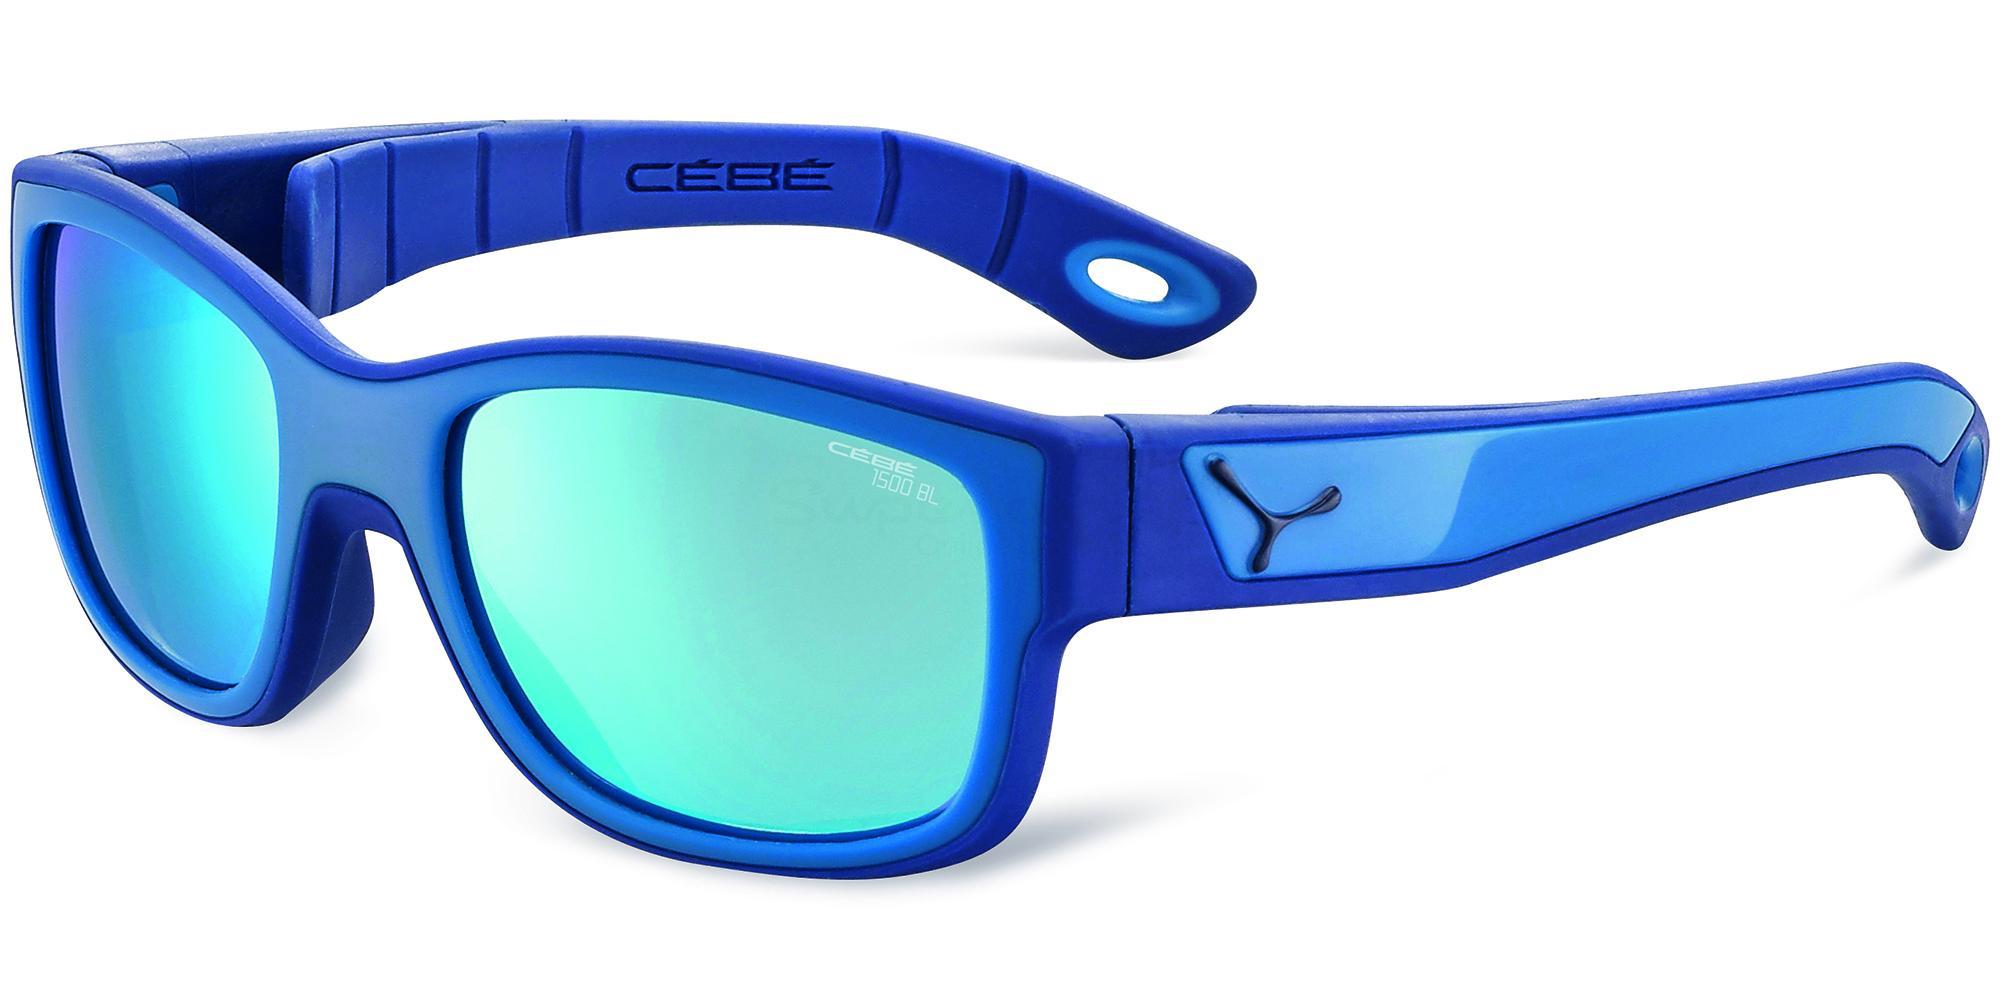 CBSTRIKE1 S'trike (Age 3-5) Sunglasses, Cebe JUNIOR